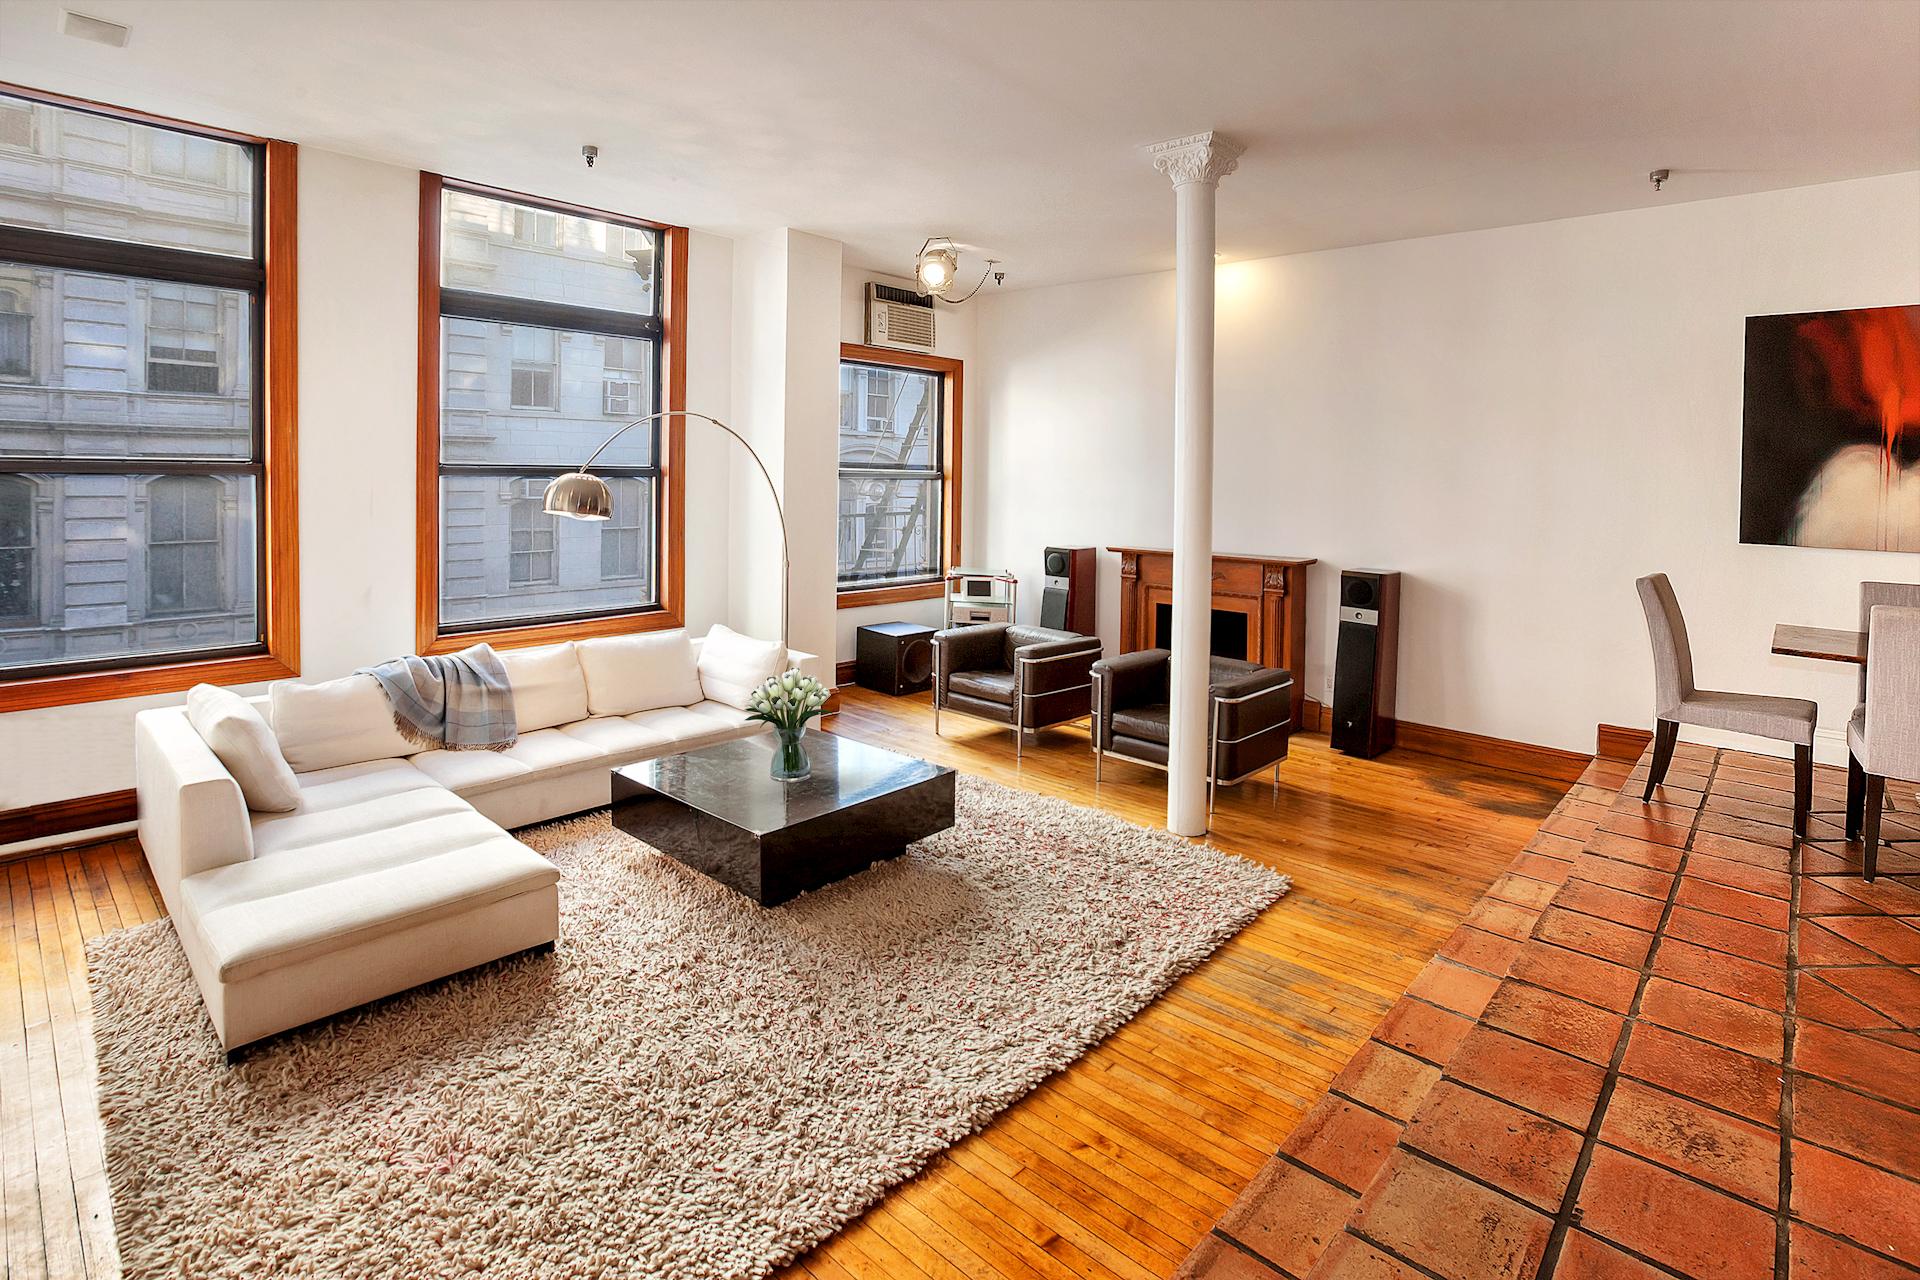 18 East 18th Street, #4W - $3,250,000